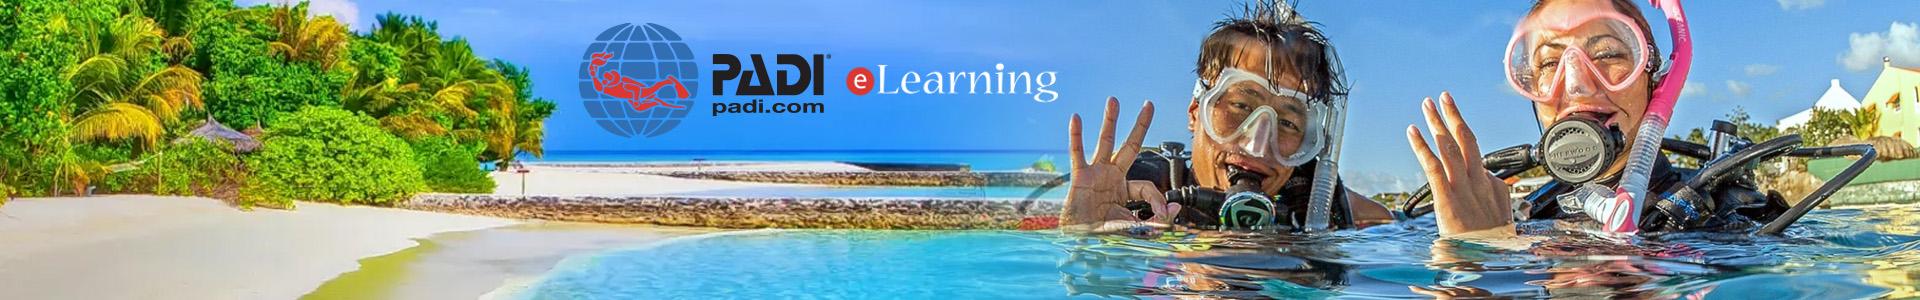 PADI eLearning Scuba Lessons Online